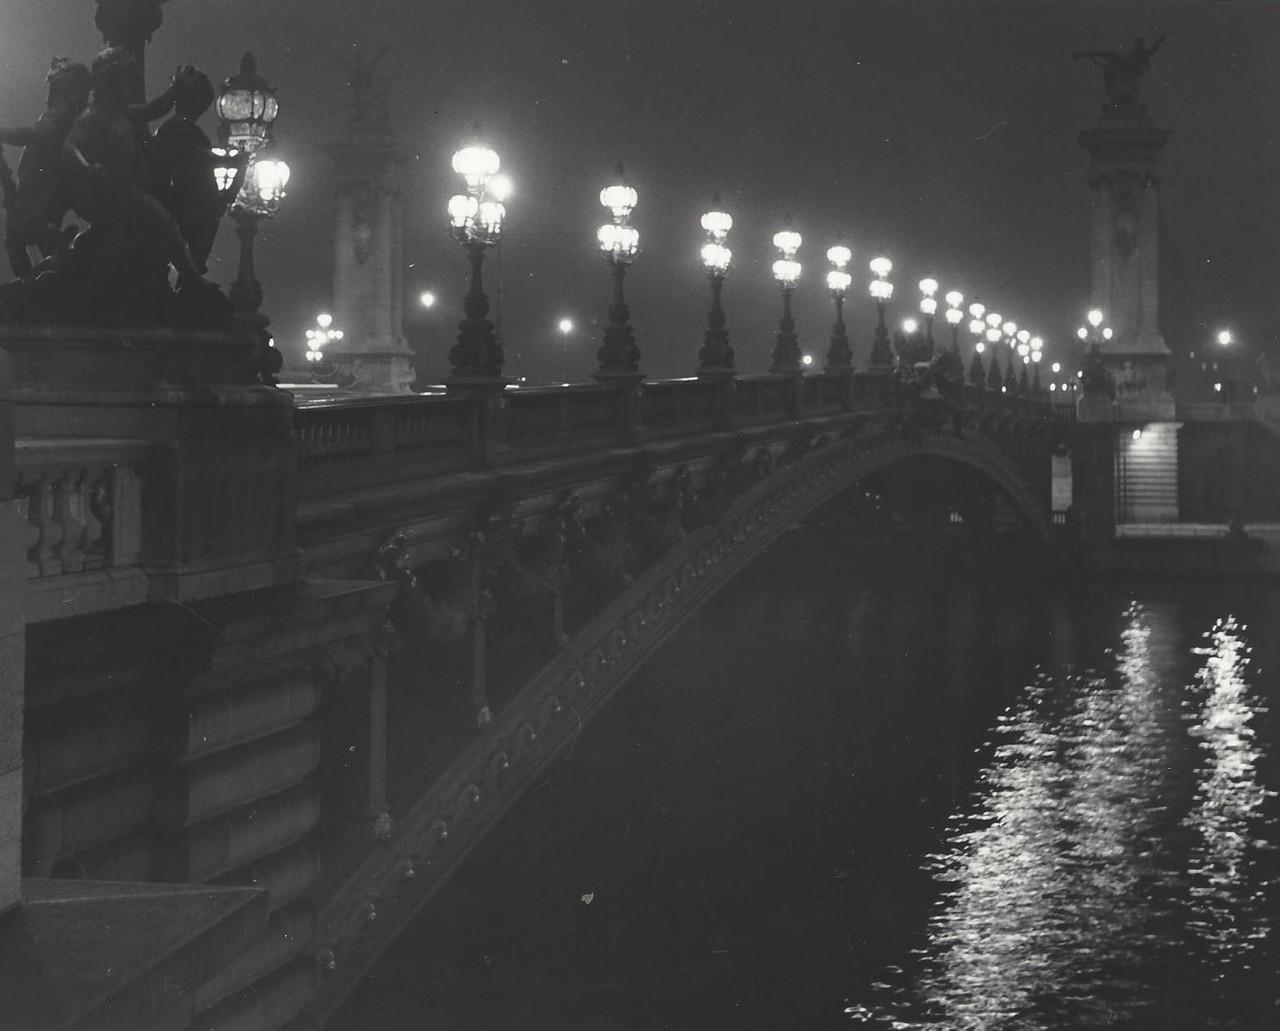 Мост Александра III, Париж, 1950-е. Фотограф Кис Шерер